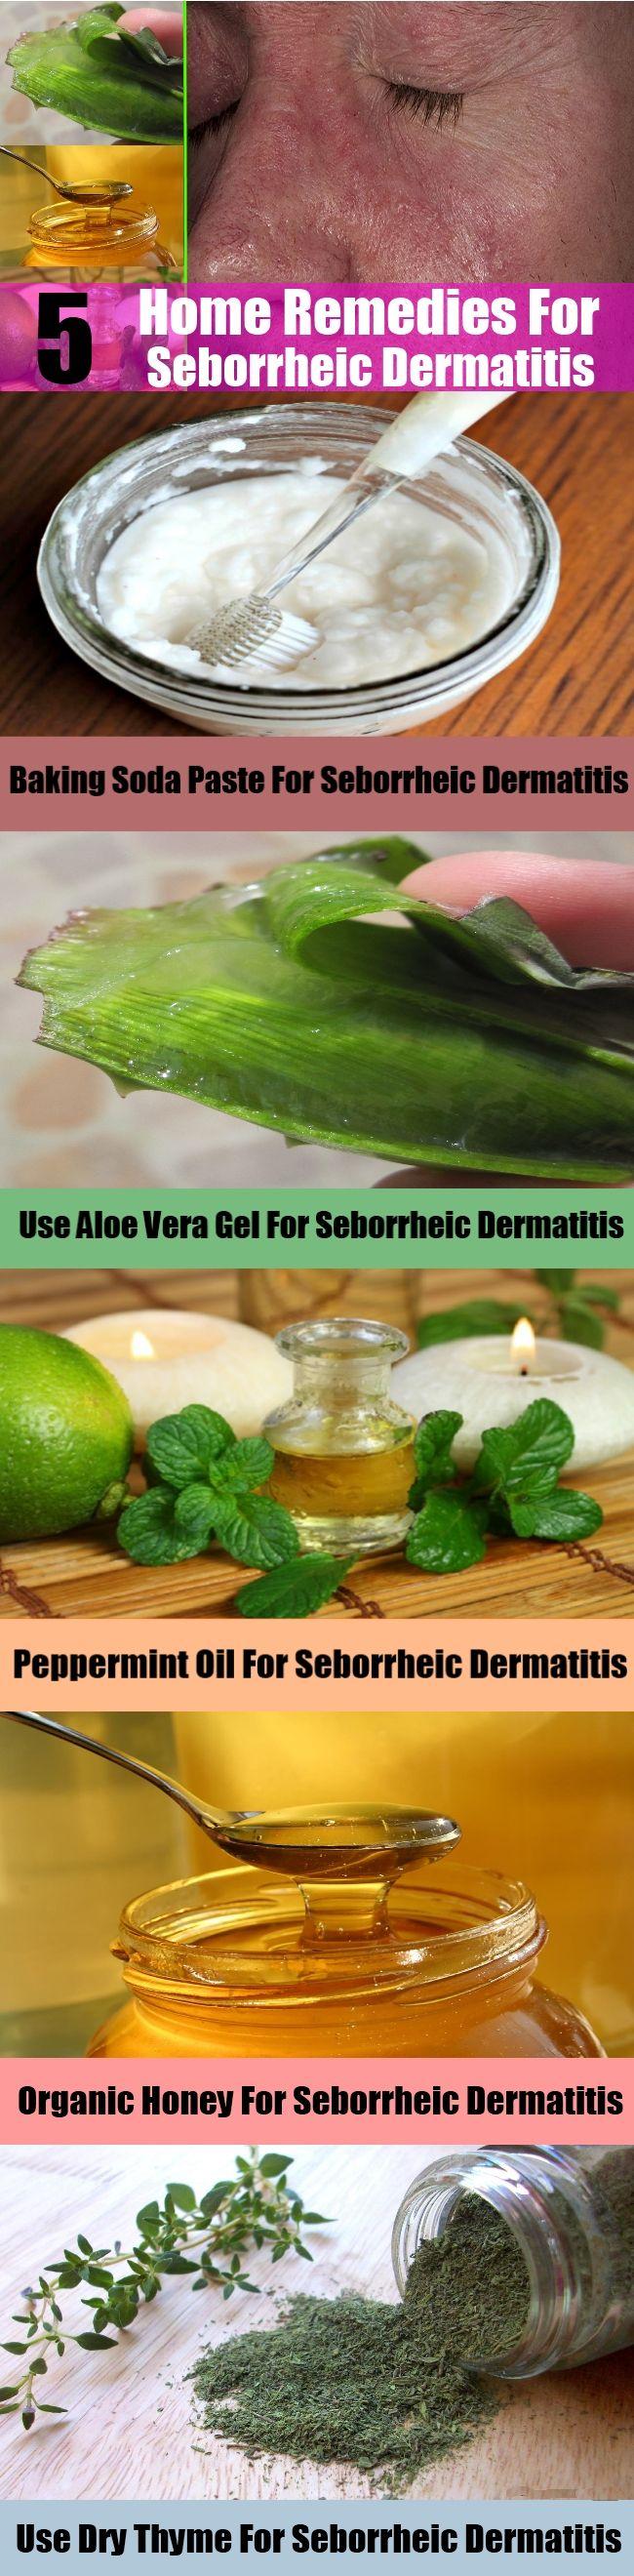 sebborheic dermatitis